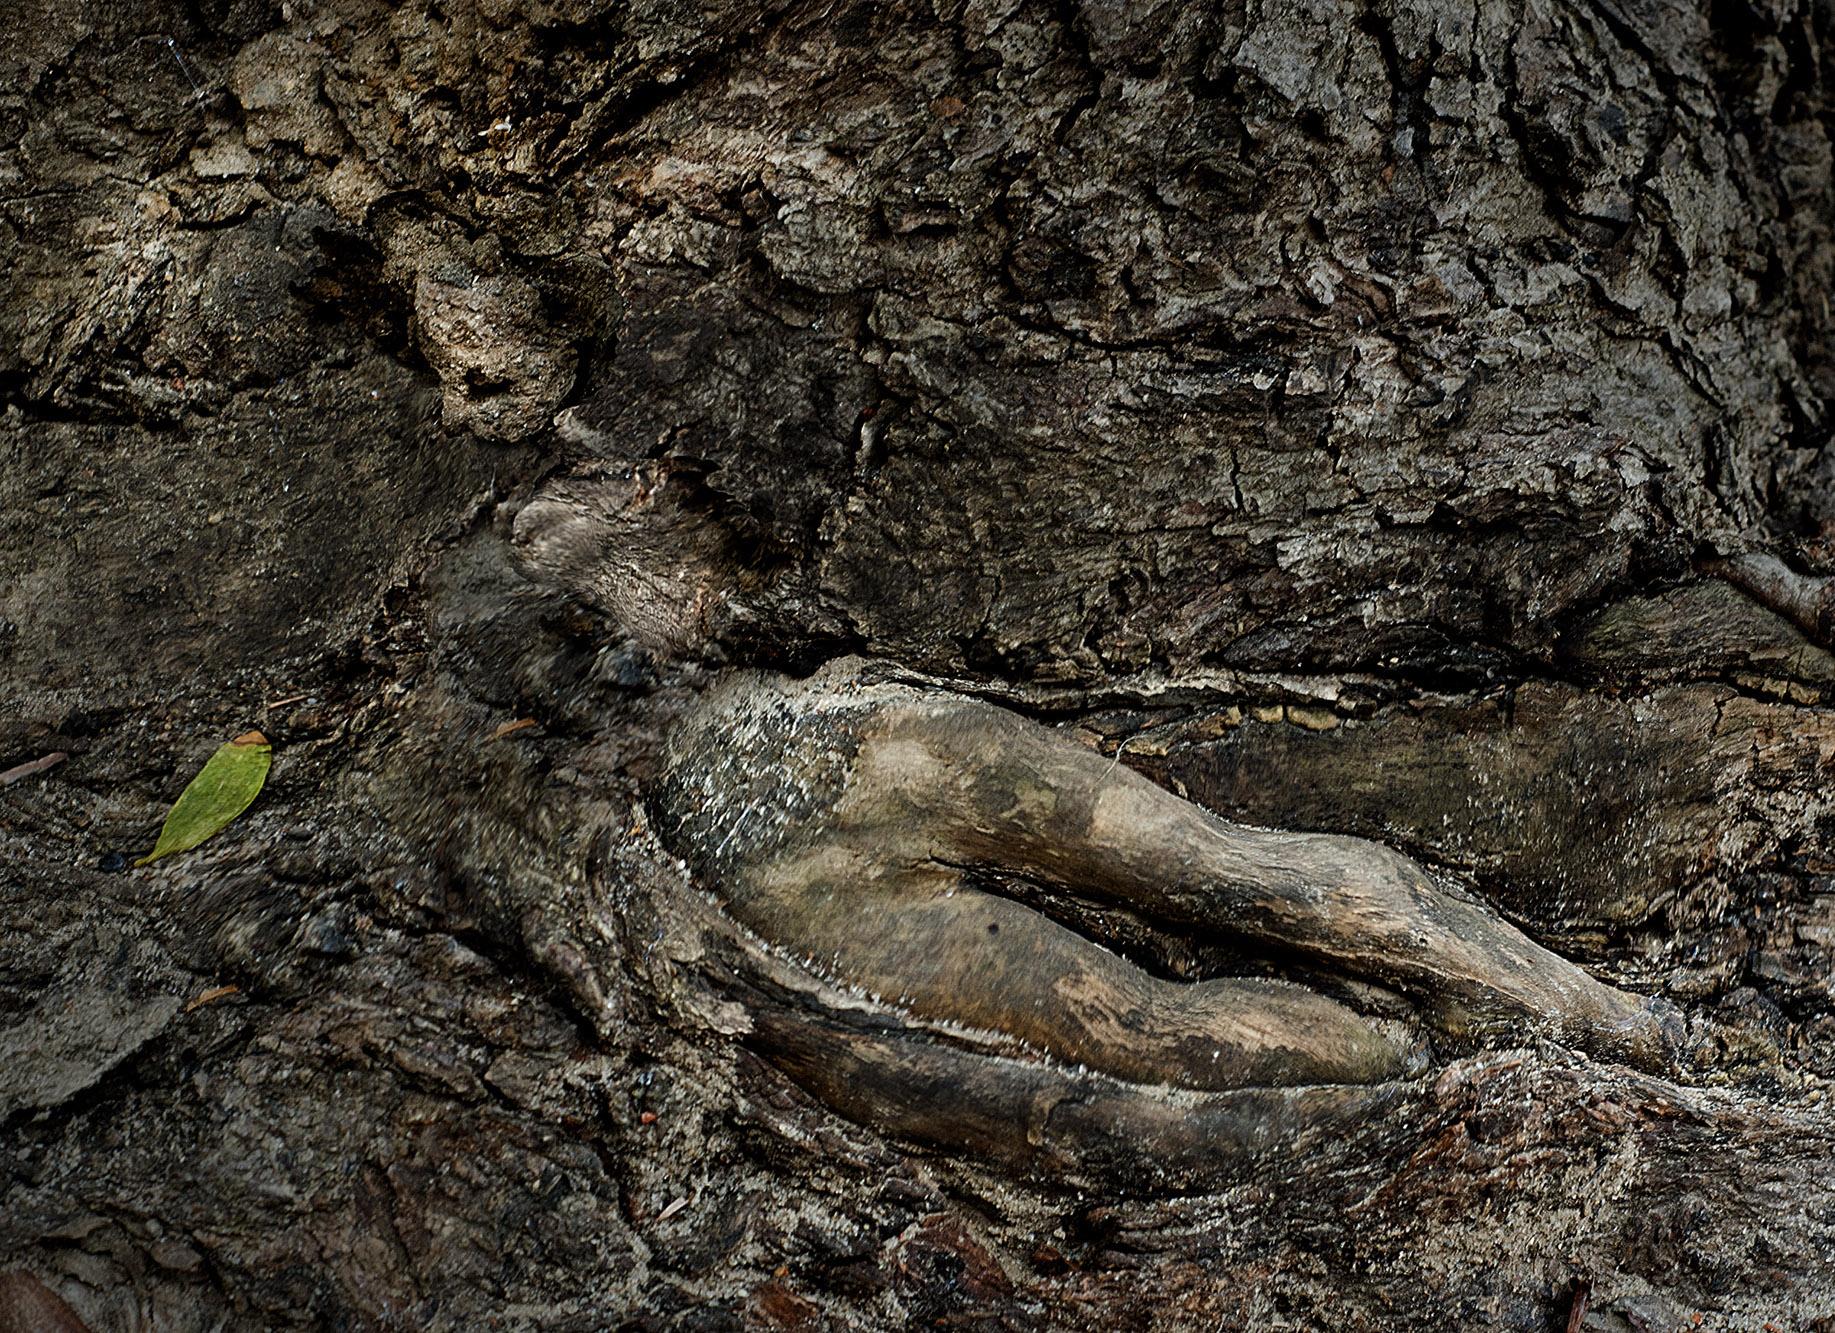 dryads tree spirits vladimir kukorenchuk artwork celeste network